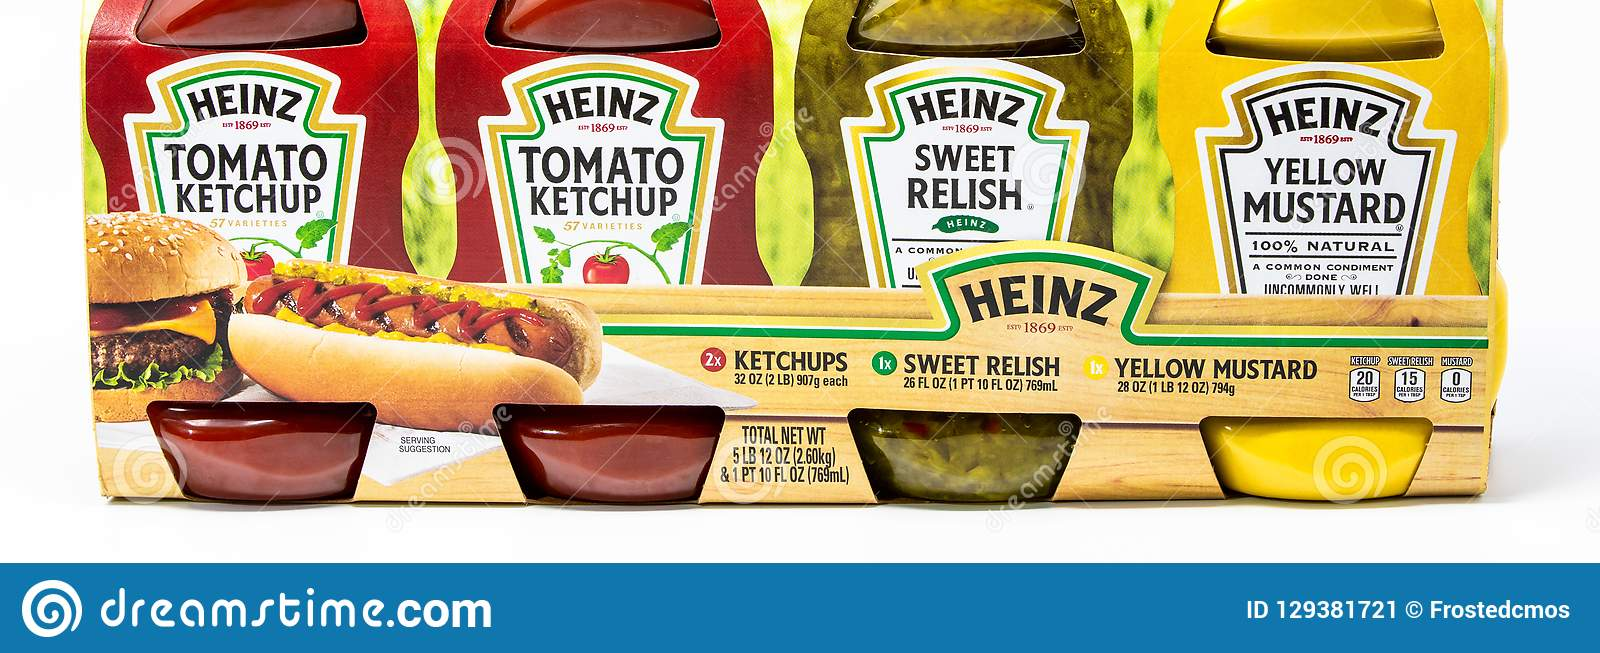 Heinz brand ketchup, yellow mustard and sweet relish